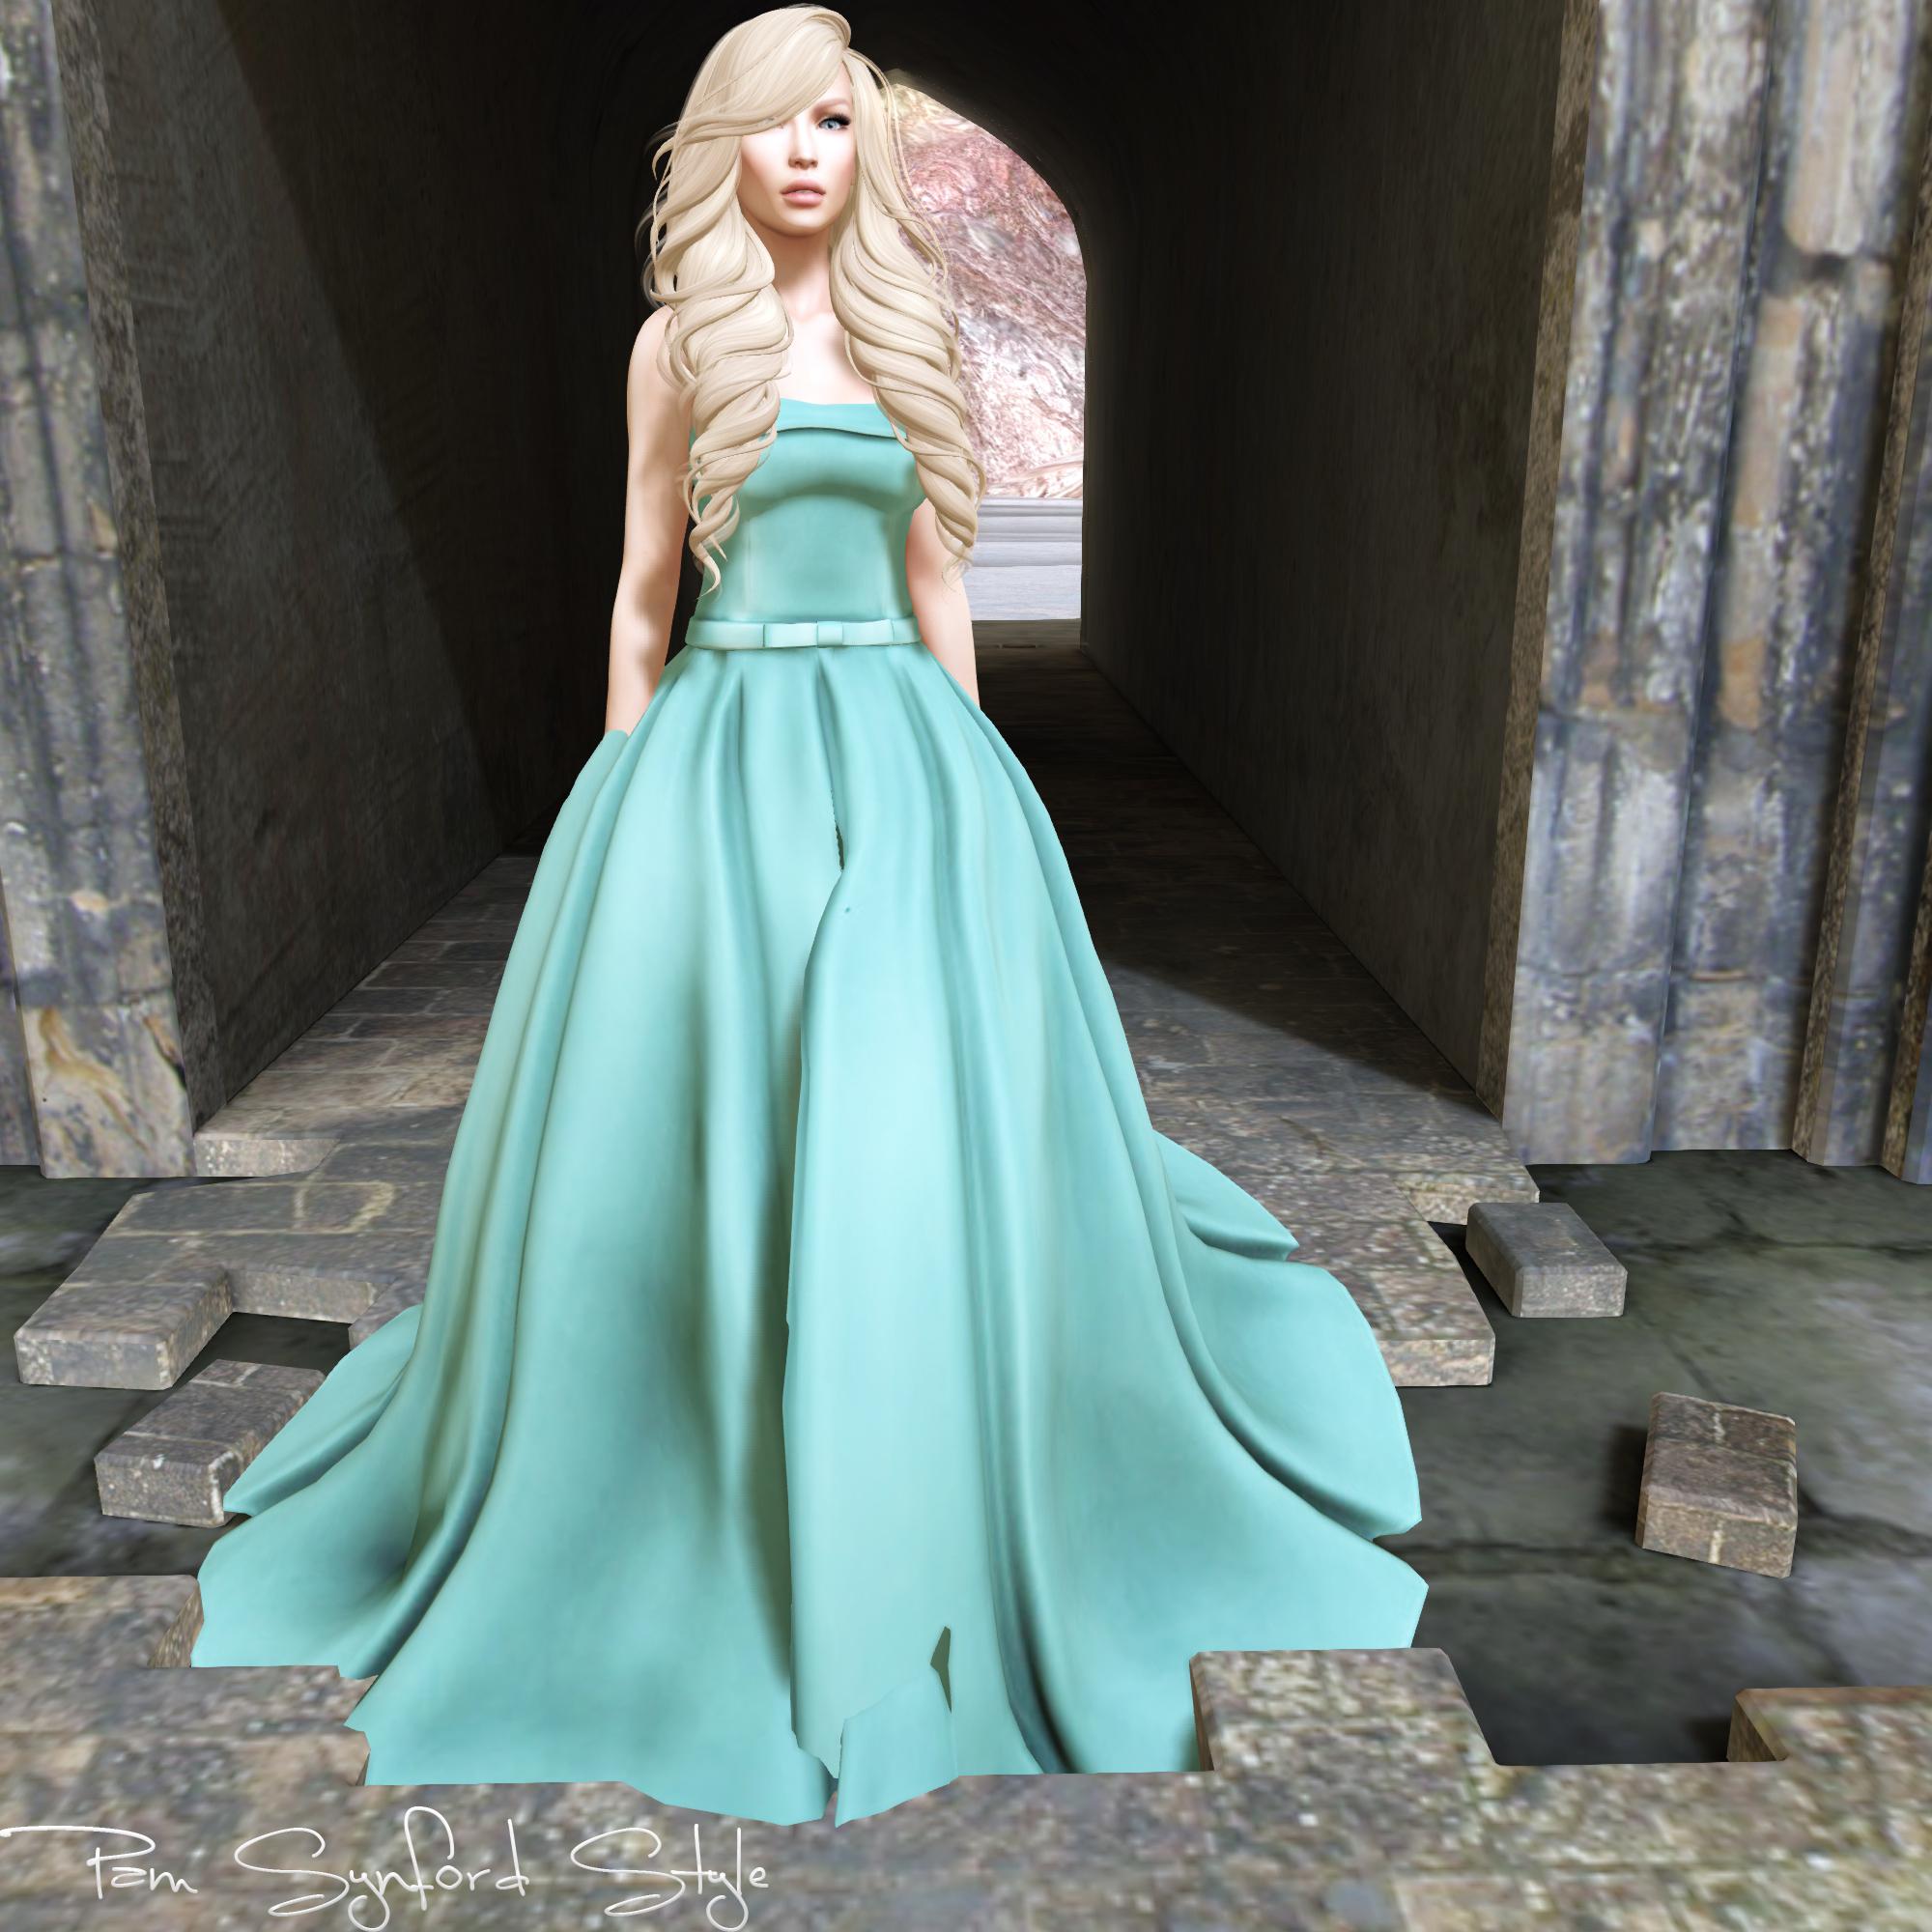 Kendrasy Creations ~ I am a princess